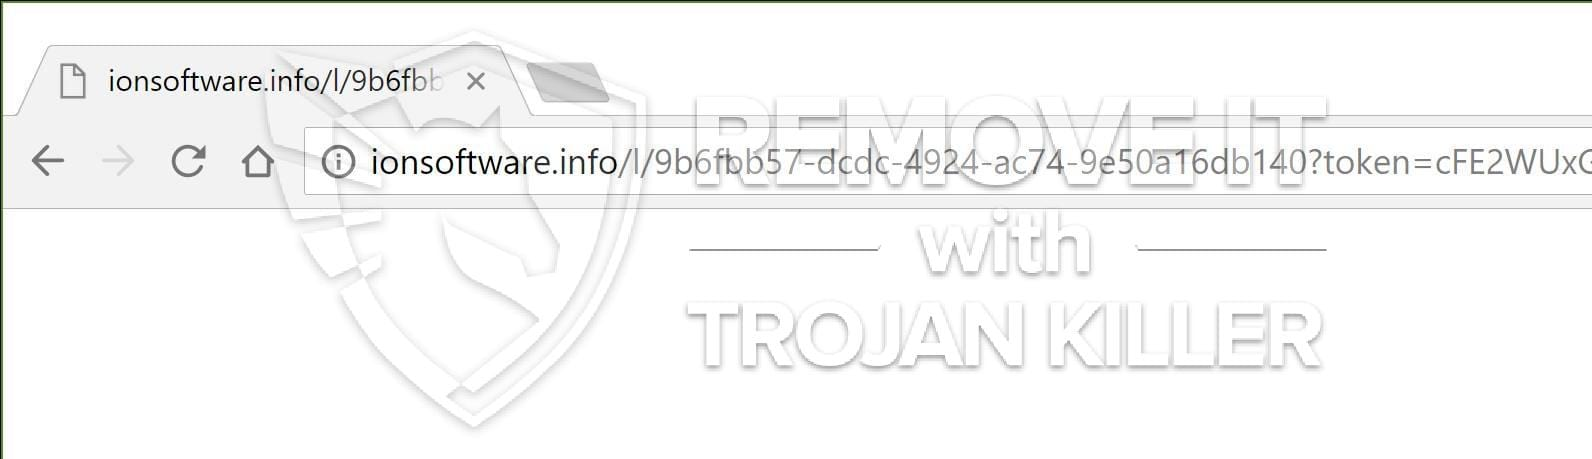 Ionsoftware.info virus